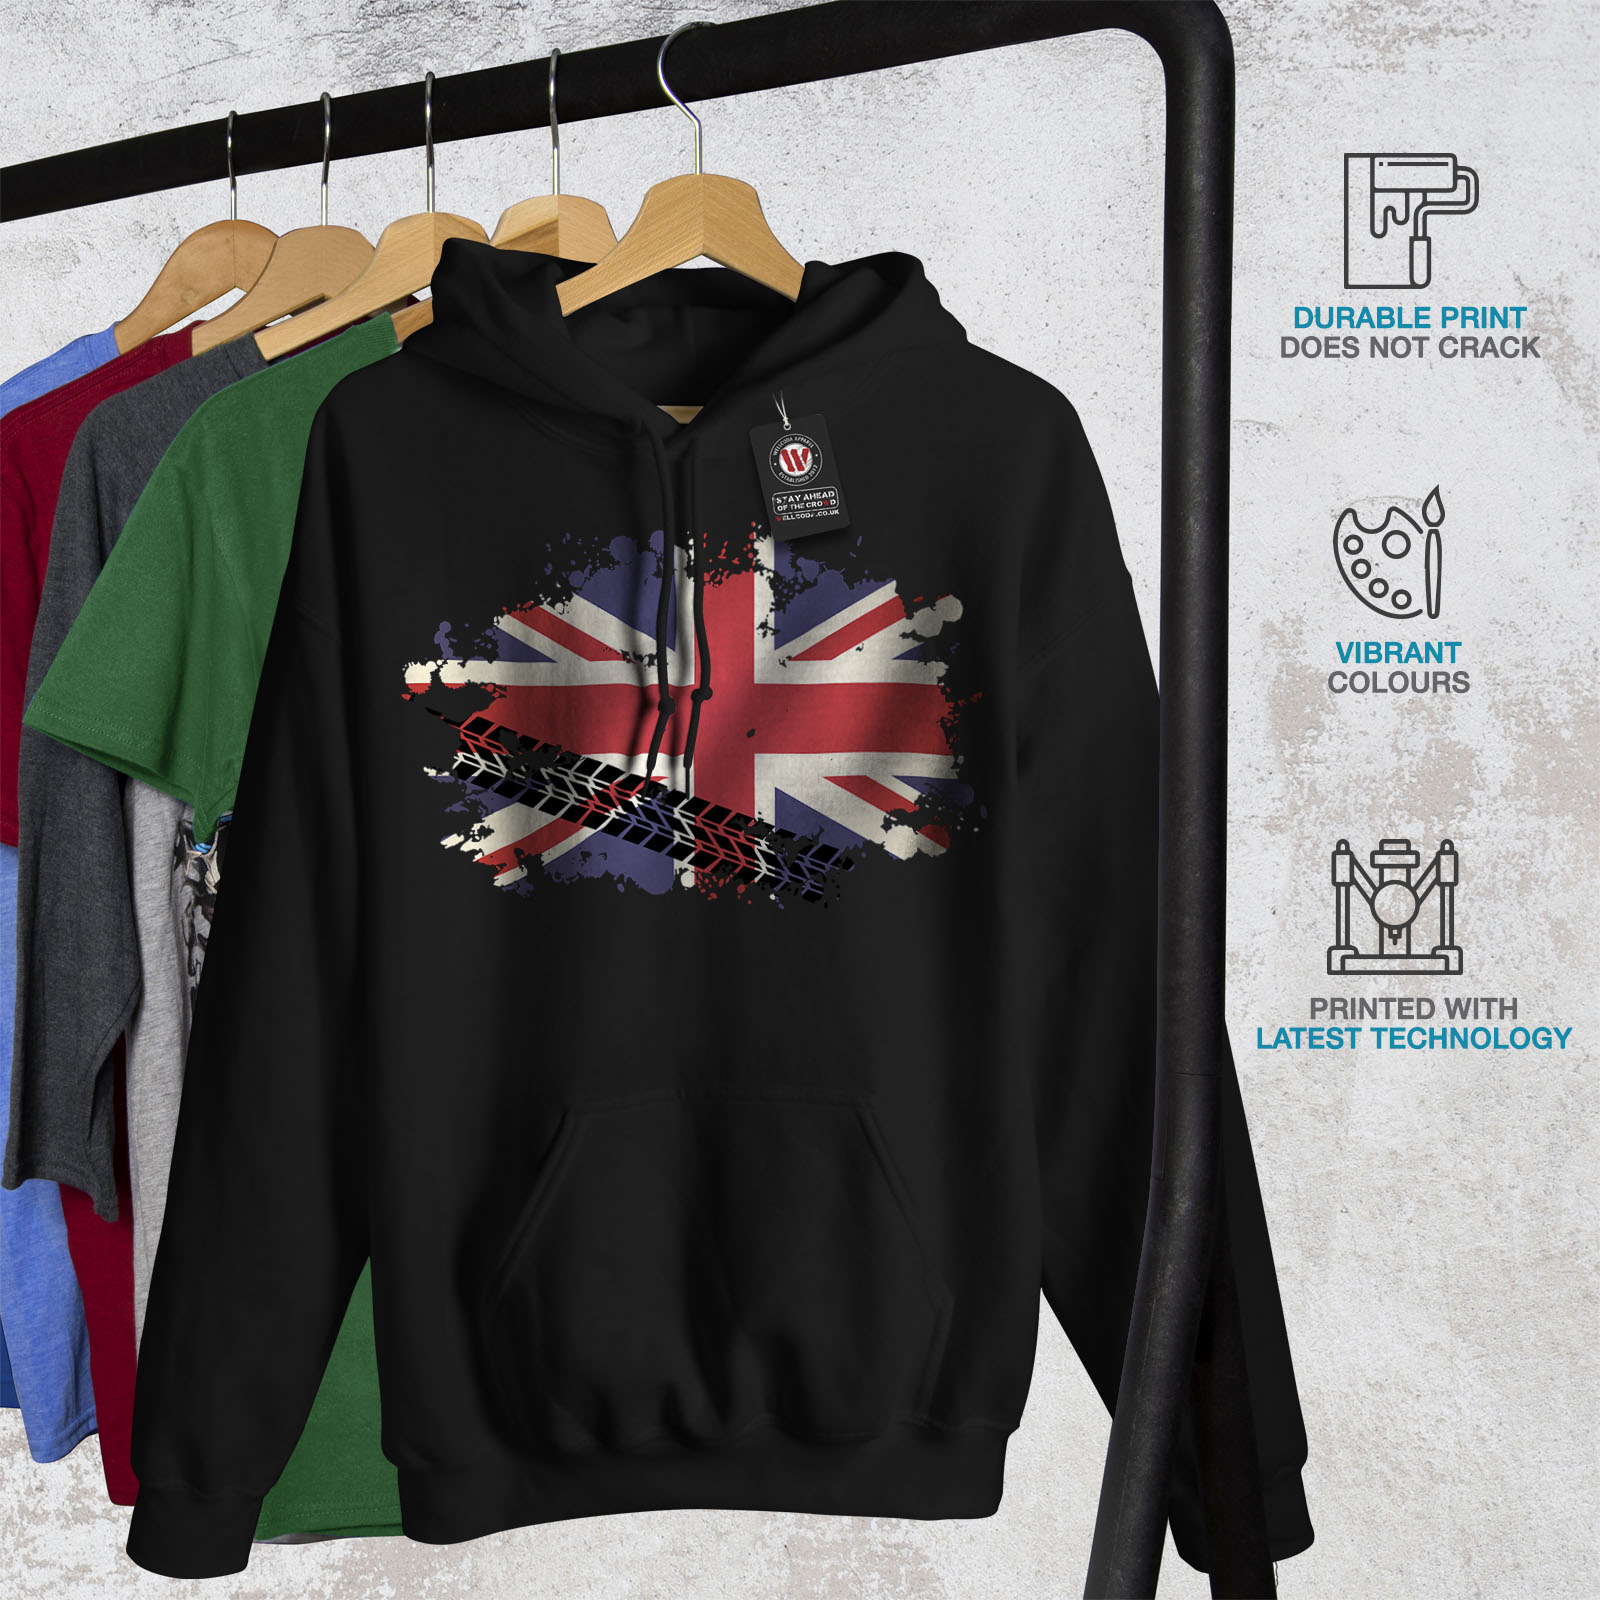 Union-Jack-Bandera-Sudadera-con-capucha-para-hombre-wellcoda-Gran-Bretana-Informal-Con-capucha miniatura 7